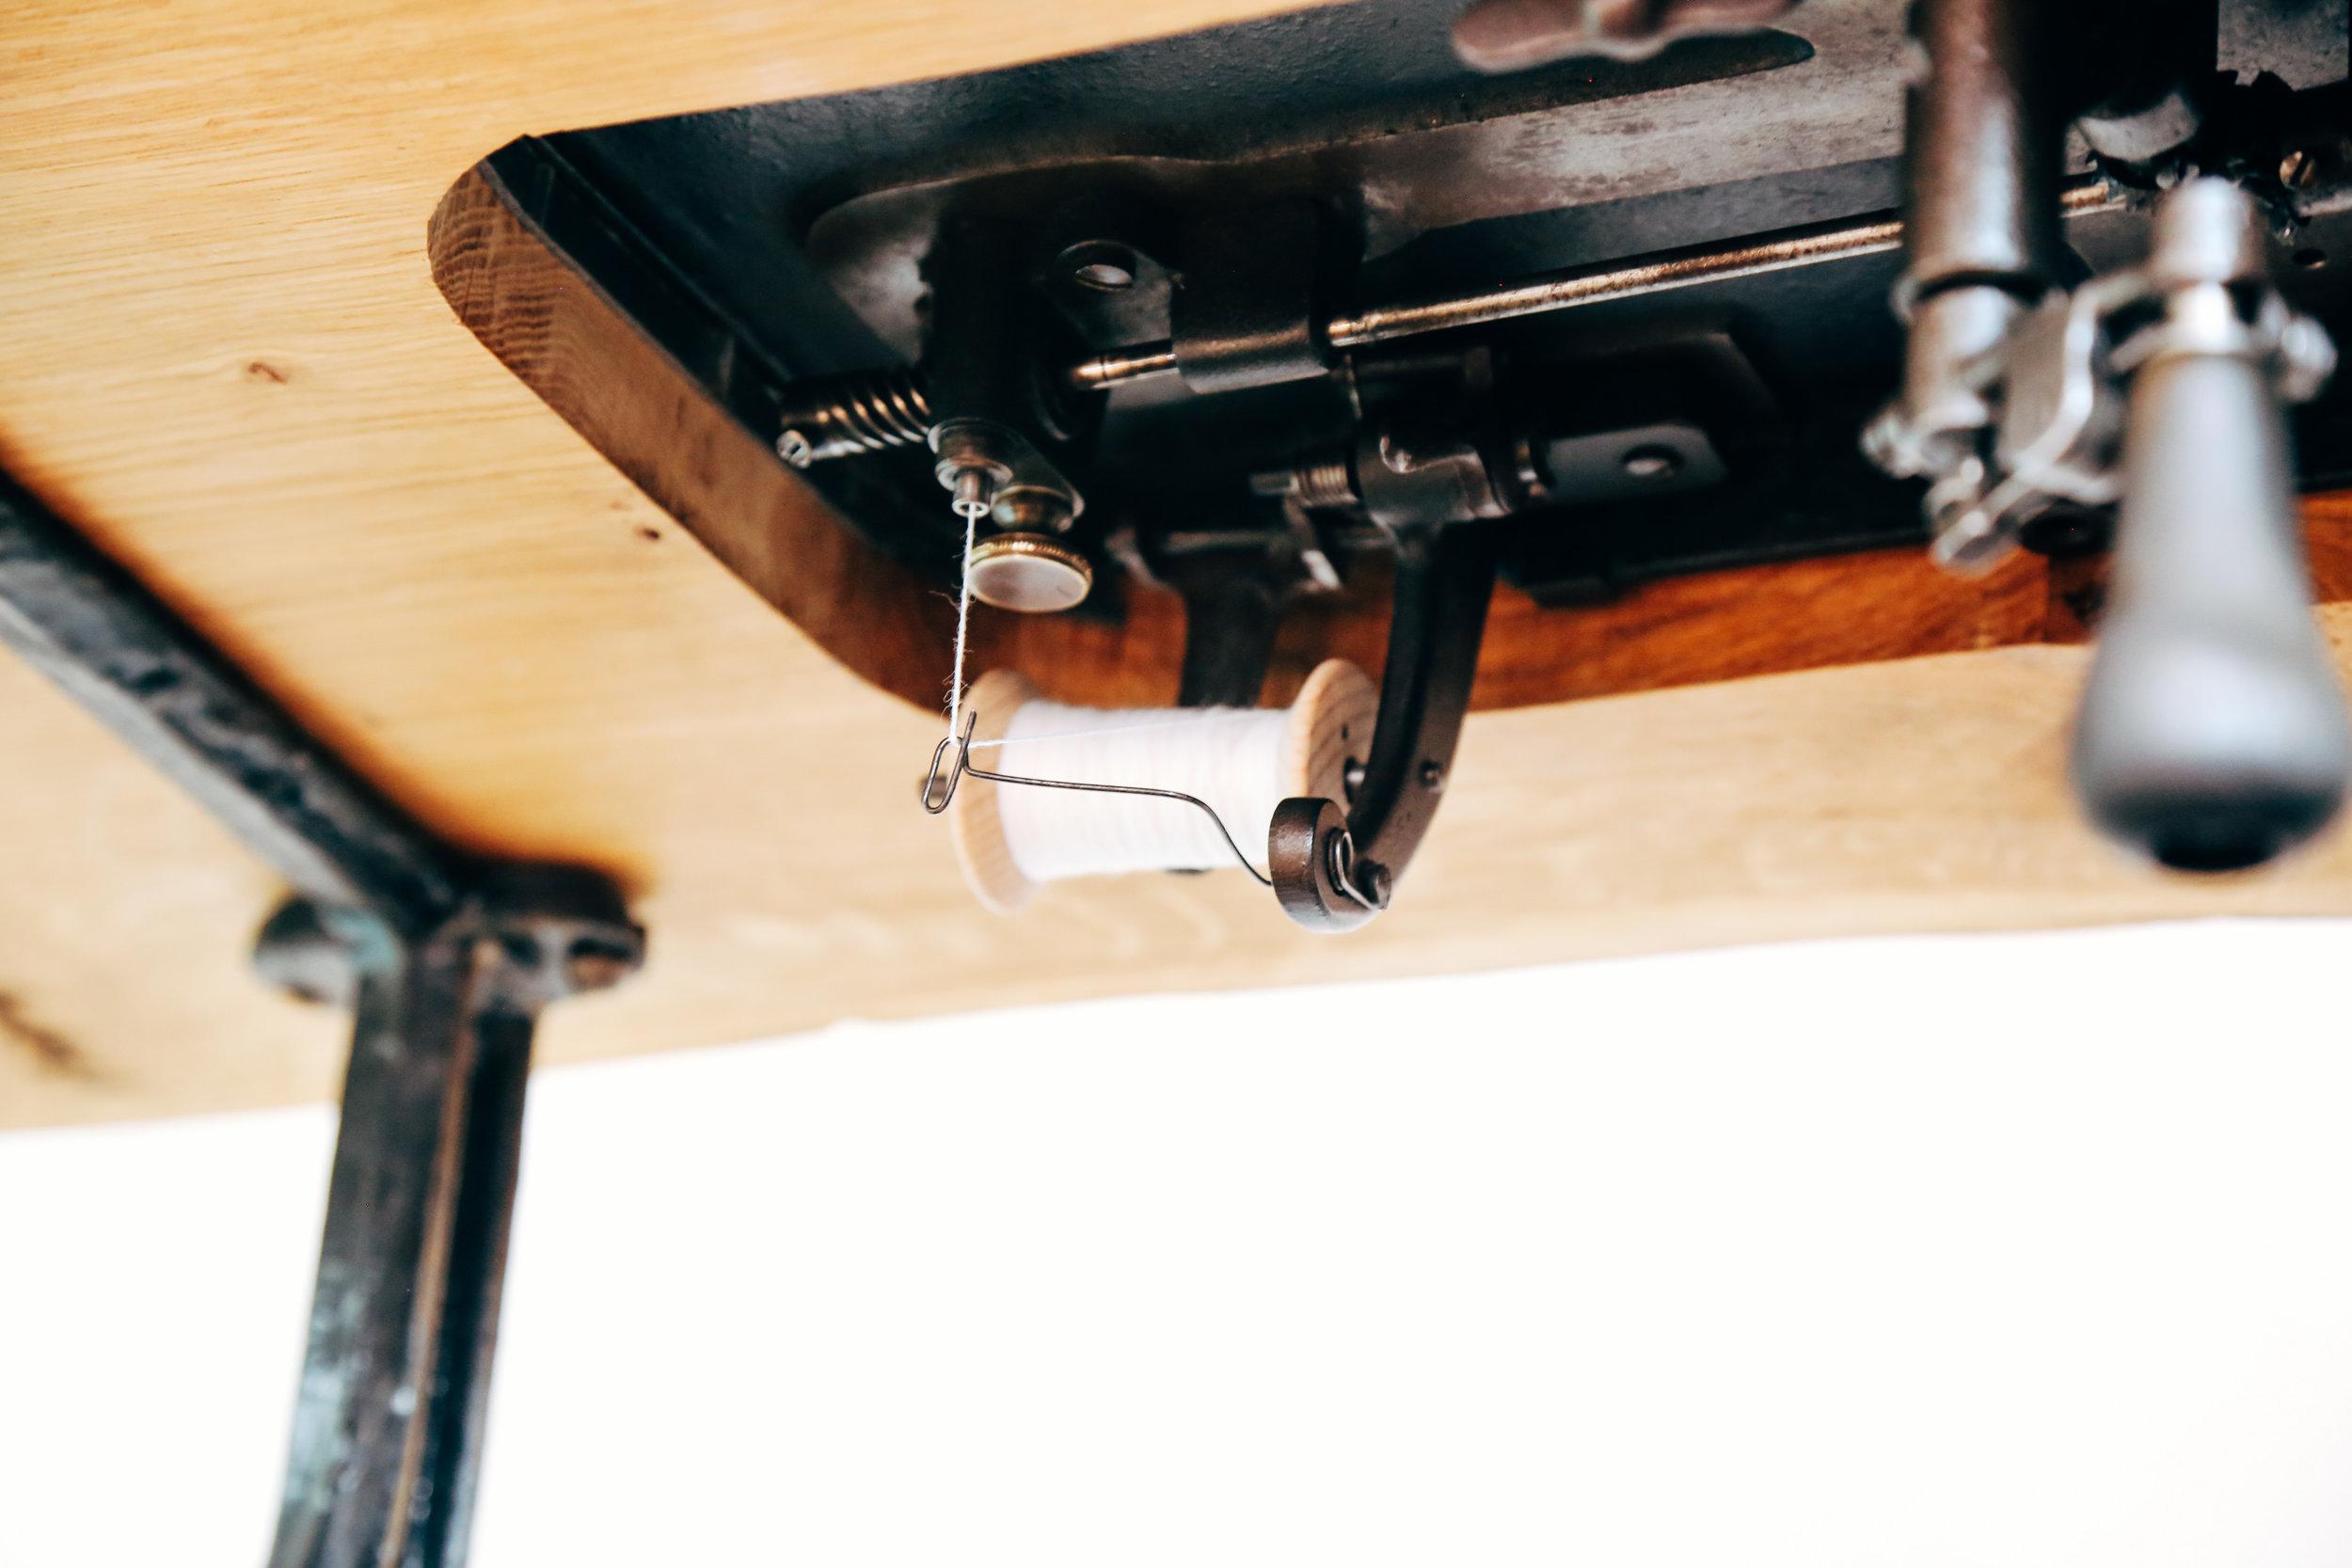 cornely-a-thread-tension-unit-spool-thread-burmilana12-saintchains-chain-stitch-machine.jpg